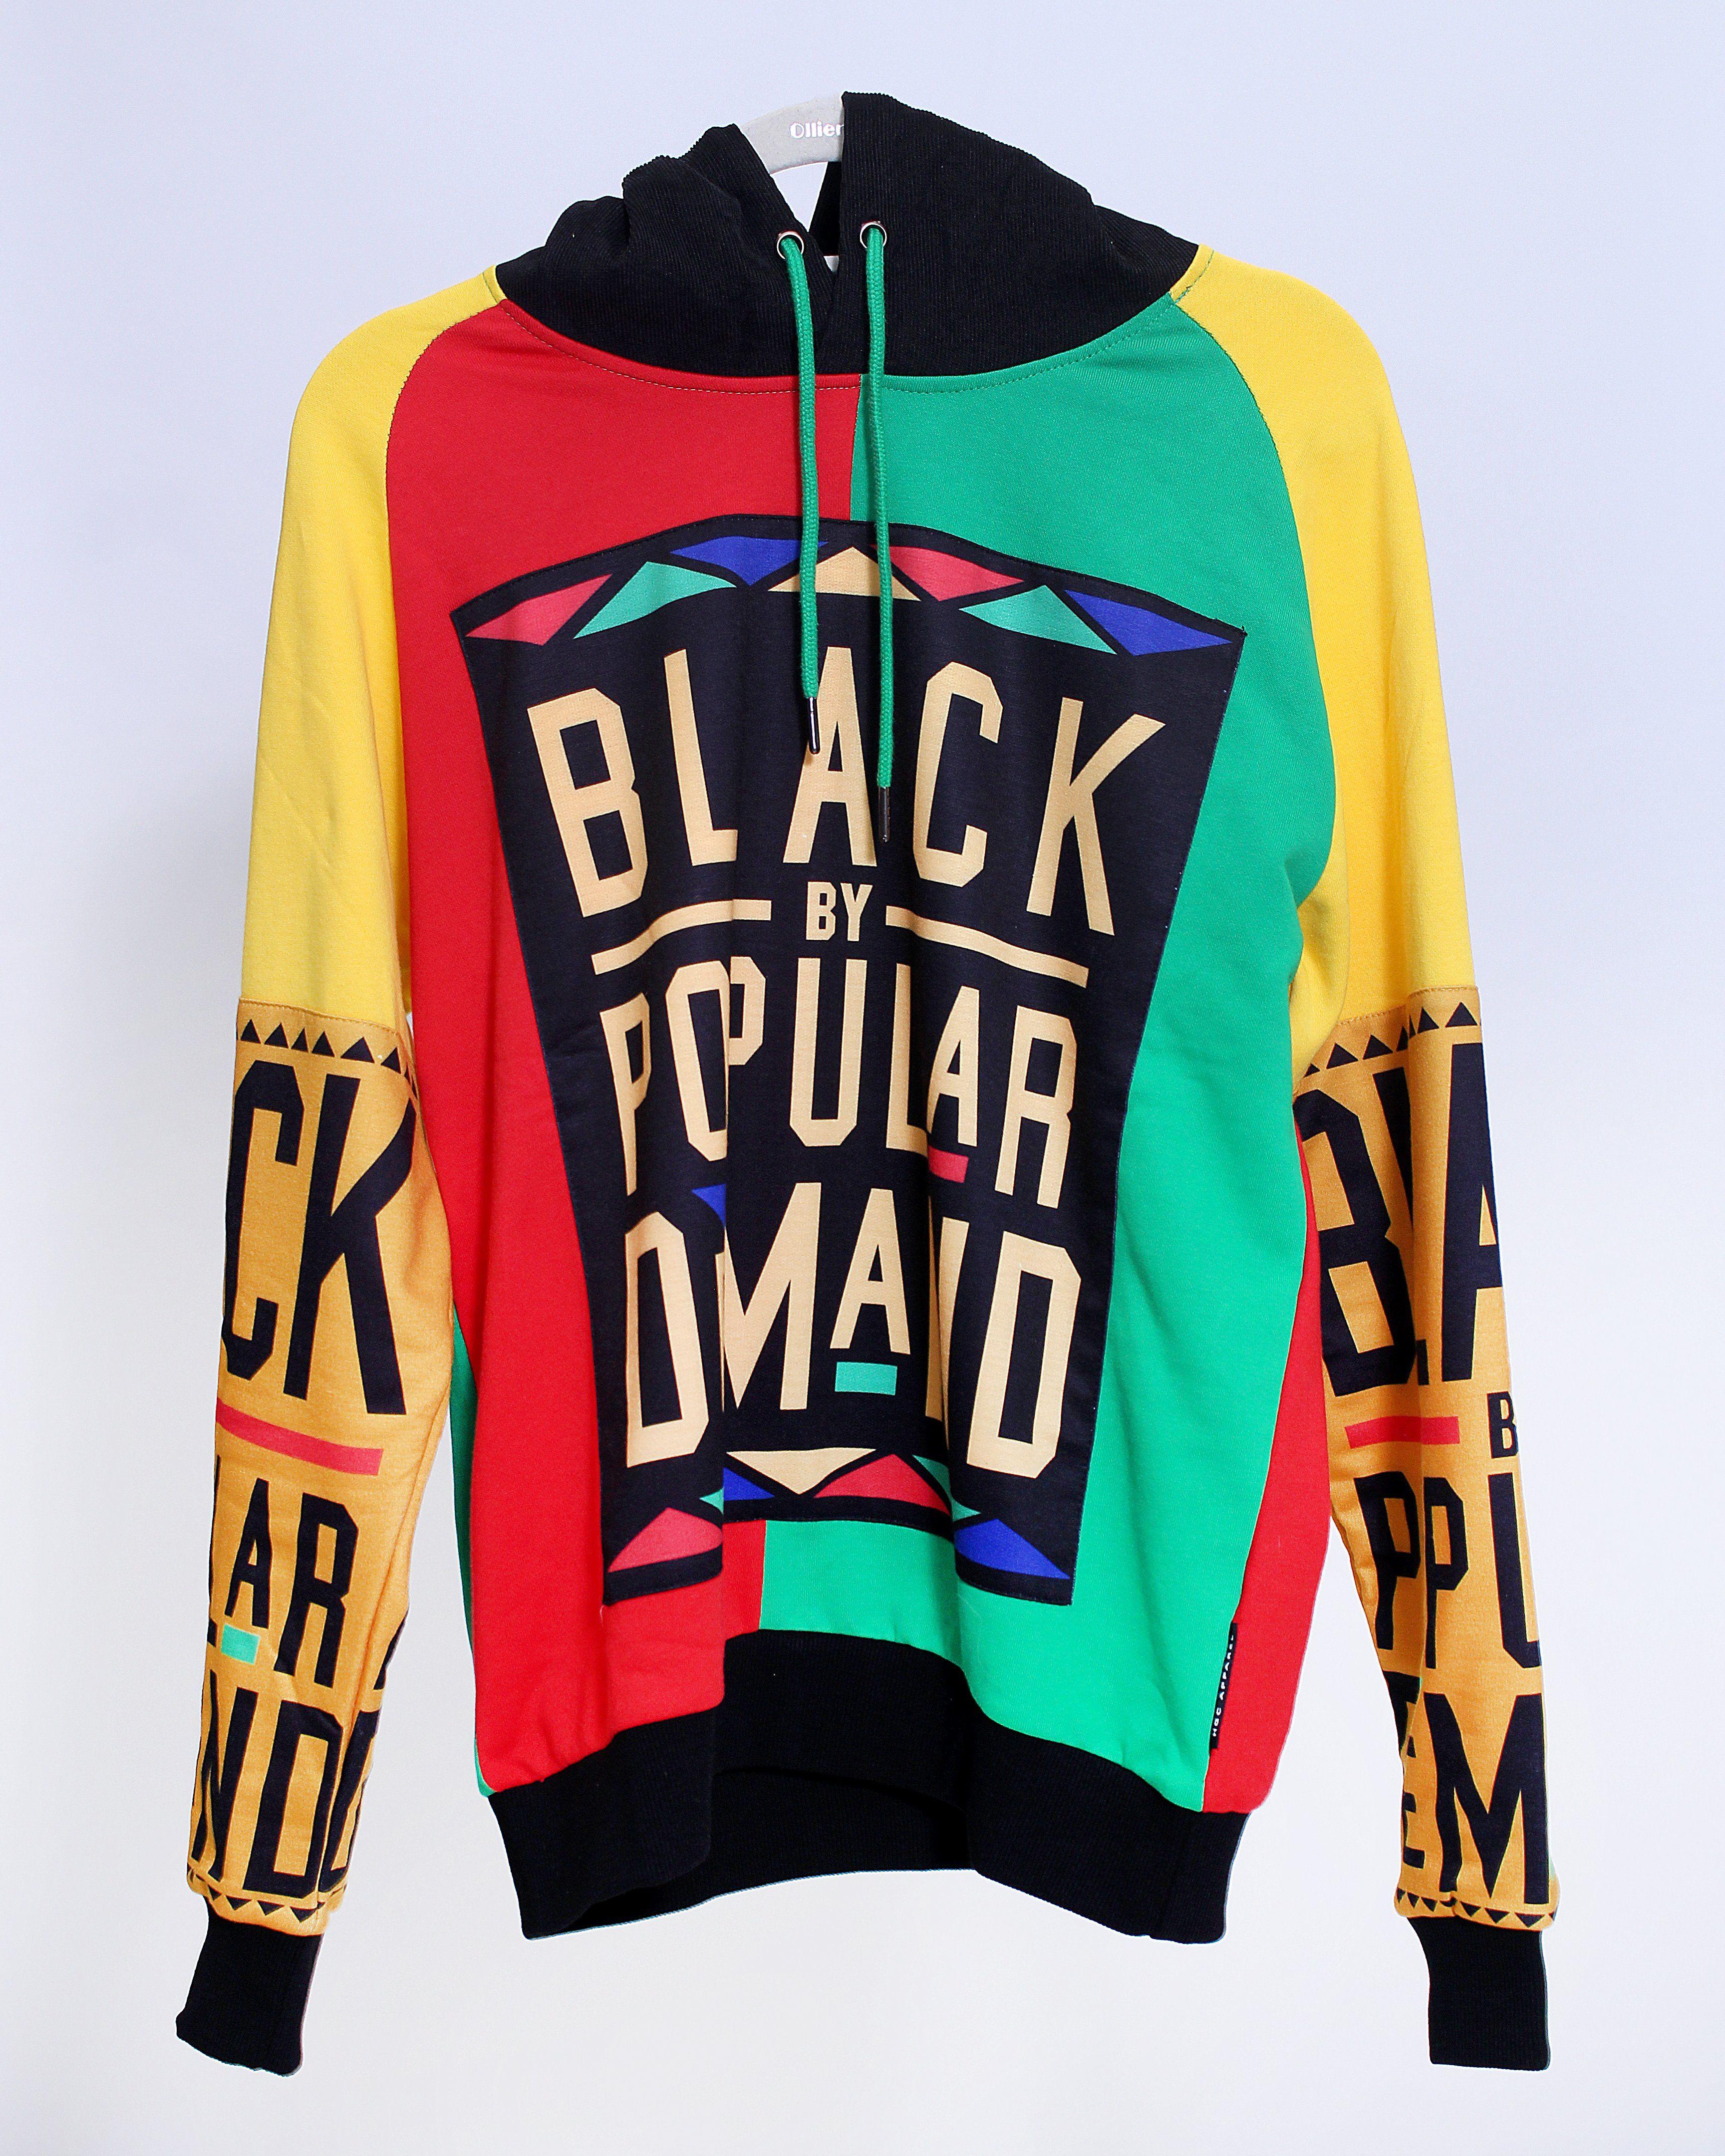 264d583177e7 BLACK BY POPULAR DEMAND® HOMAGE COLLECTION Unisex Hoodie Sweatshirt ...